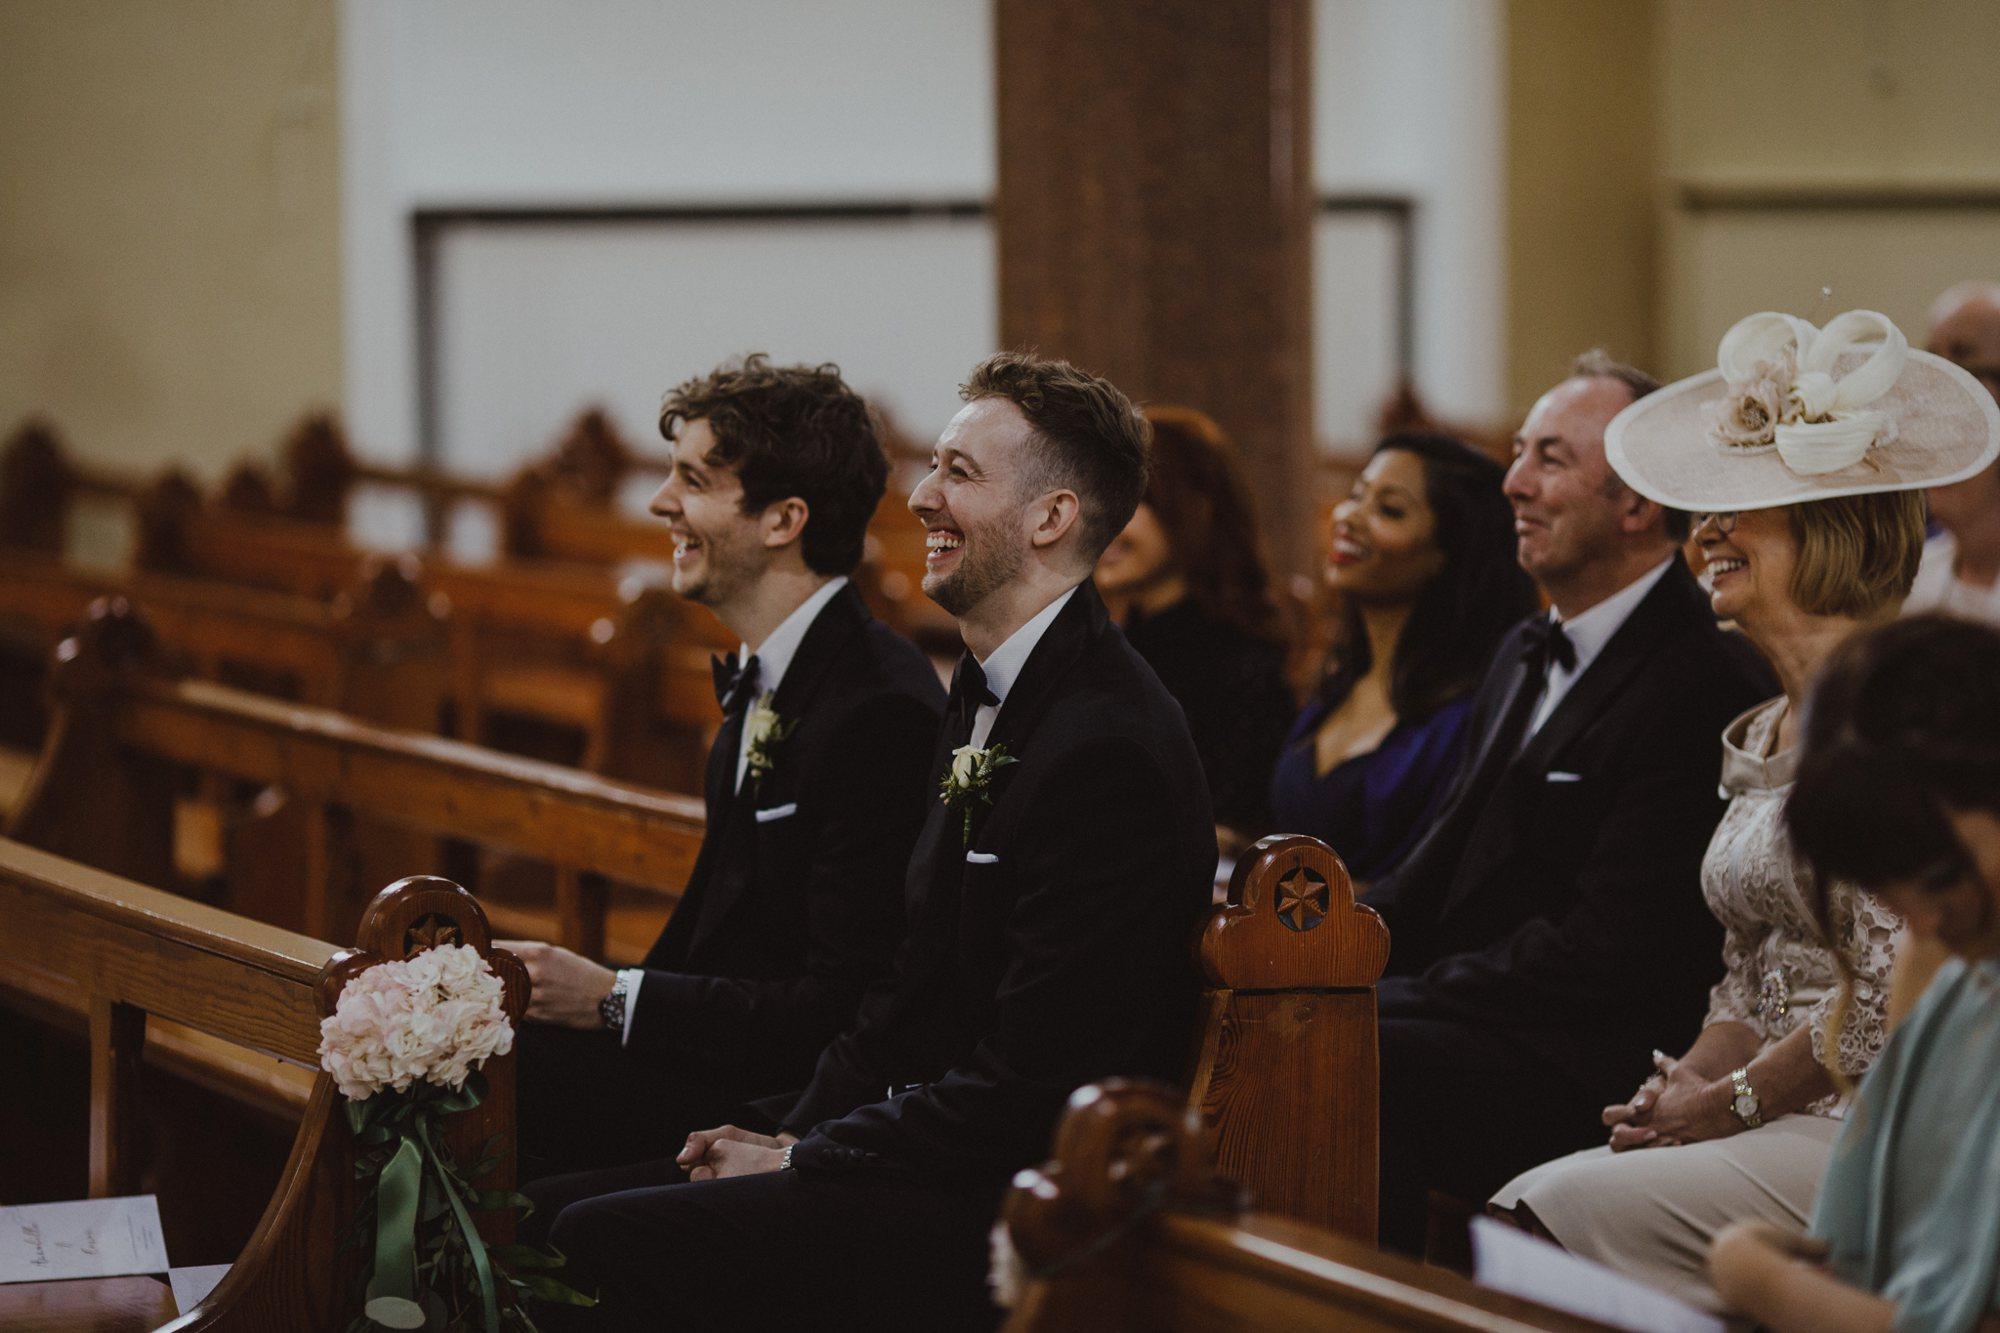 church-wedding-ireland_0036.jpg